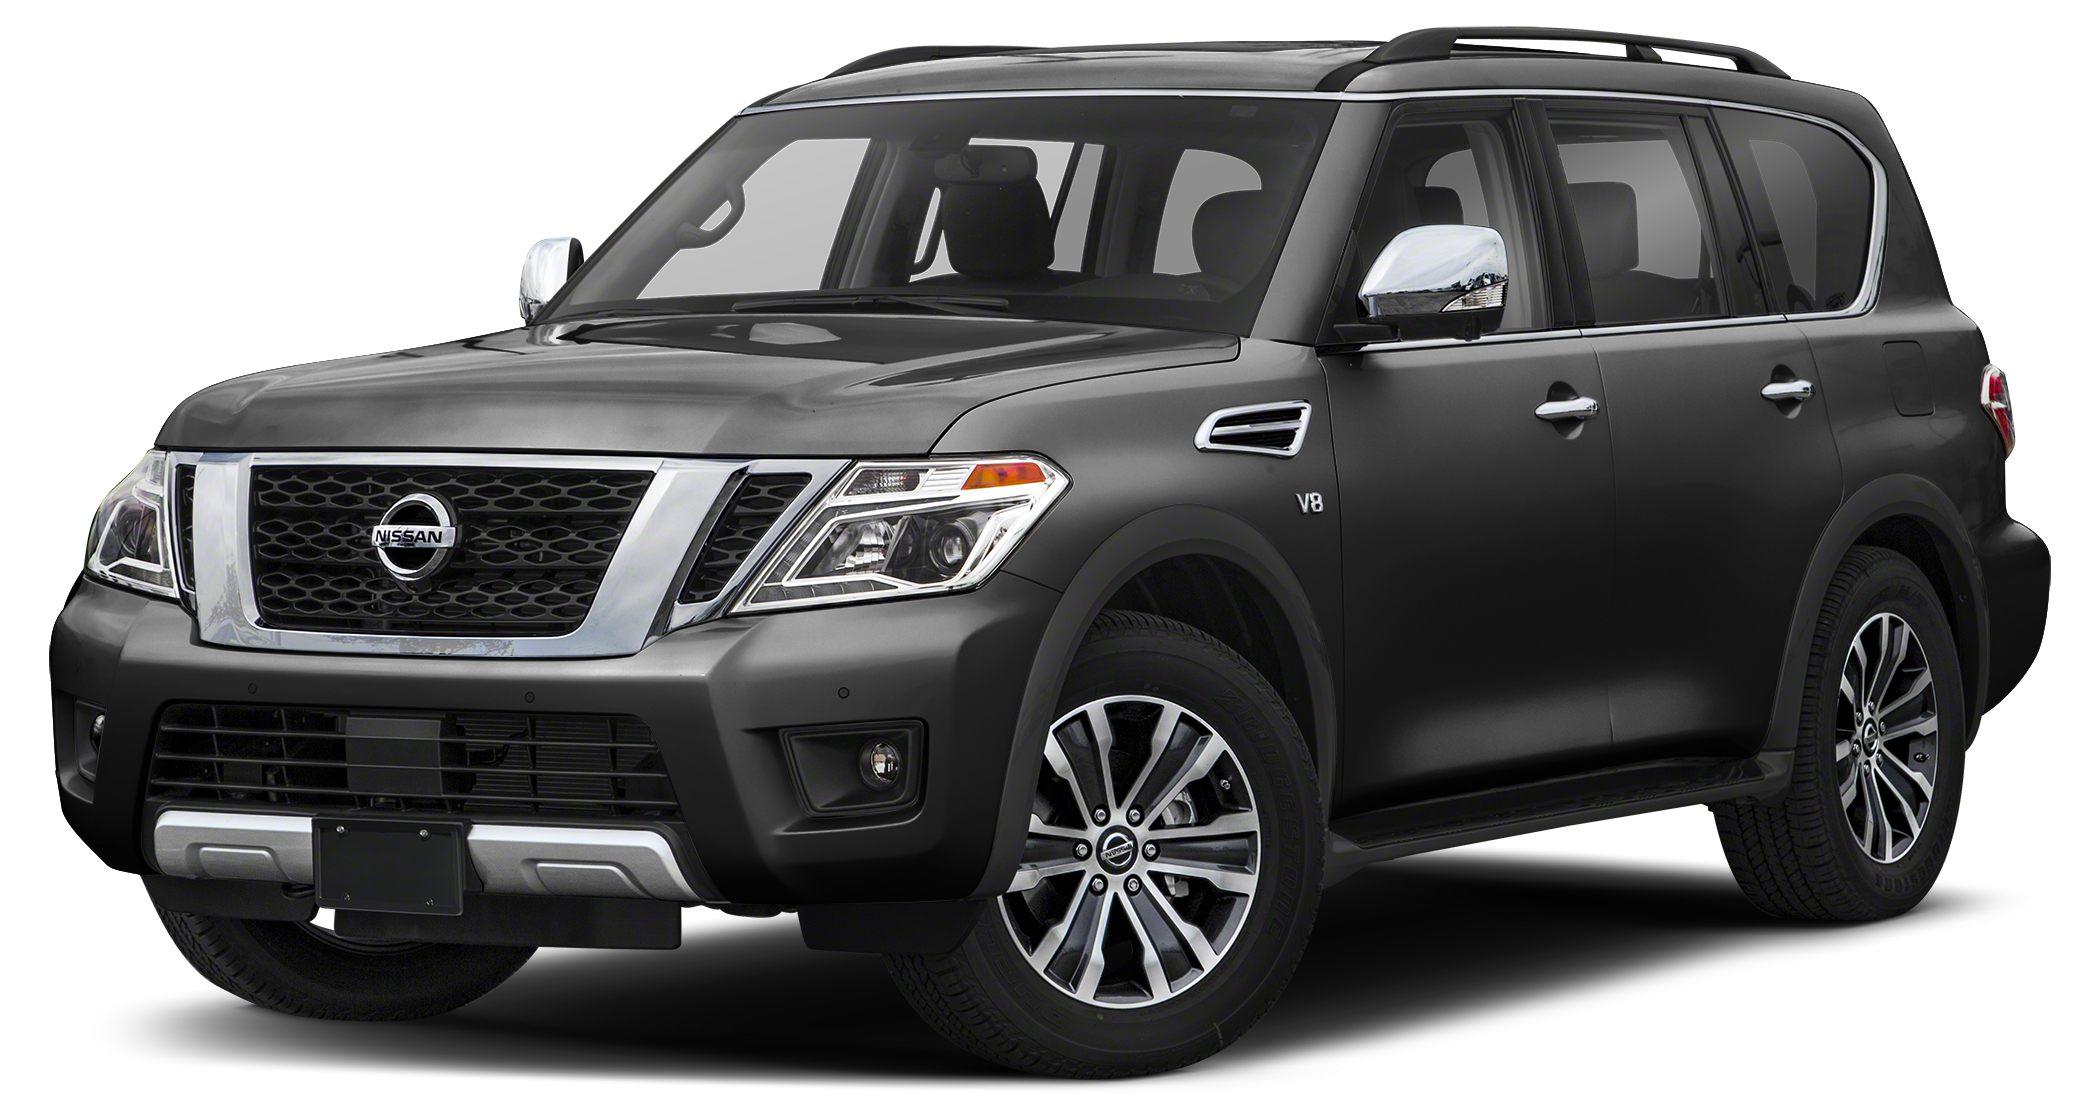 2017 Nissan Armada SL New Arrival Navigation Bluetooth This 2017 Nissan Armada SL is Mocha Al